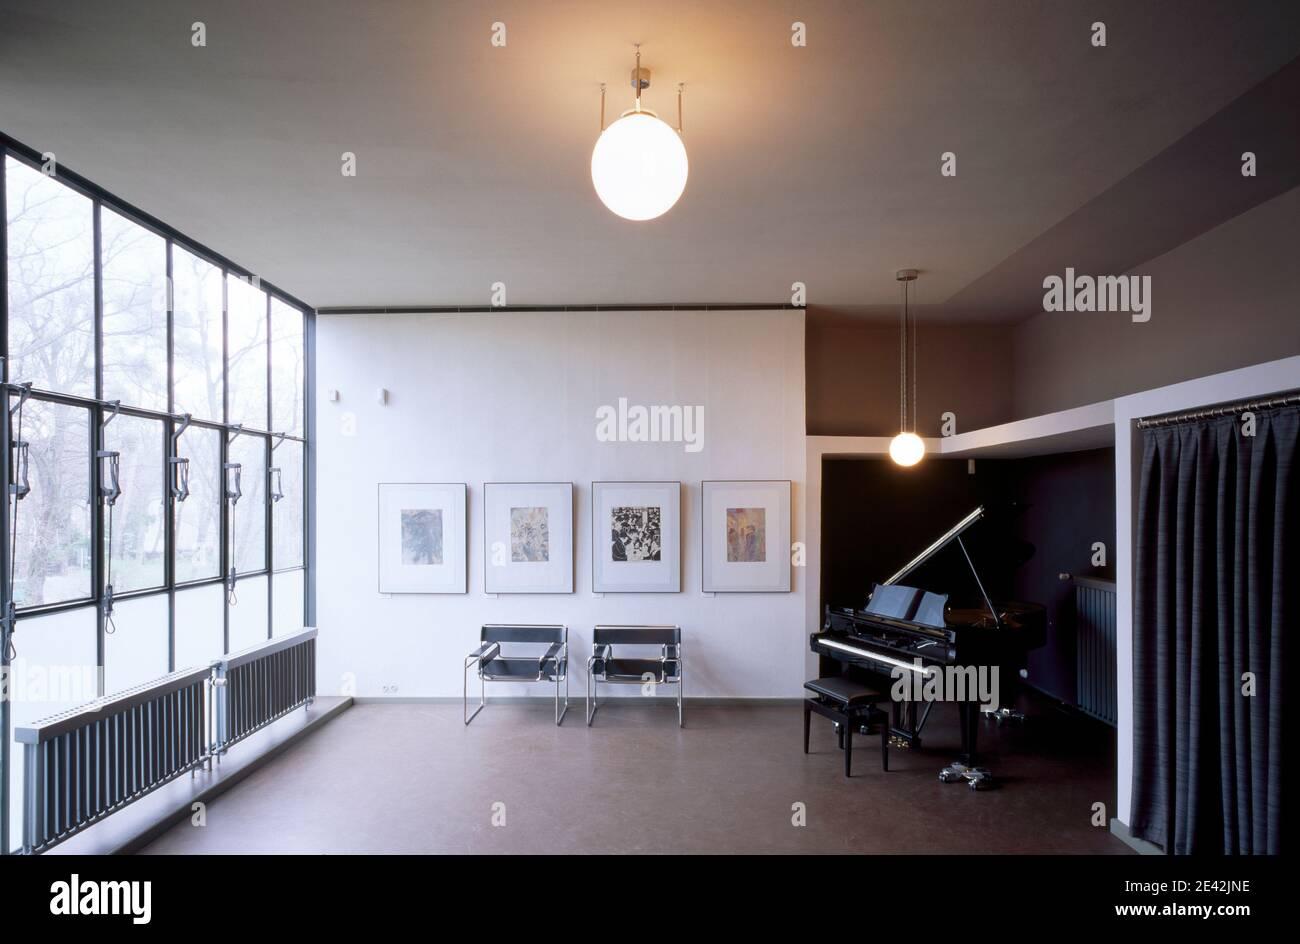 Feininger-Haus, Atelier Stock Photo